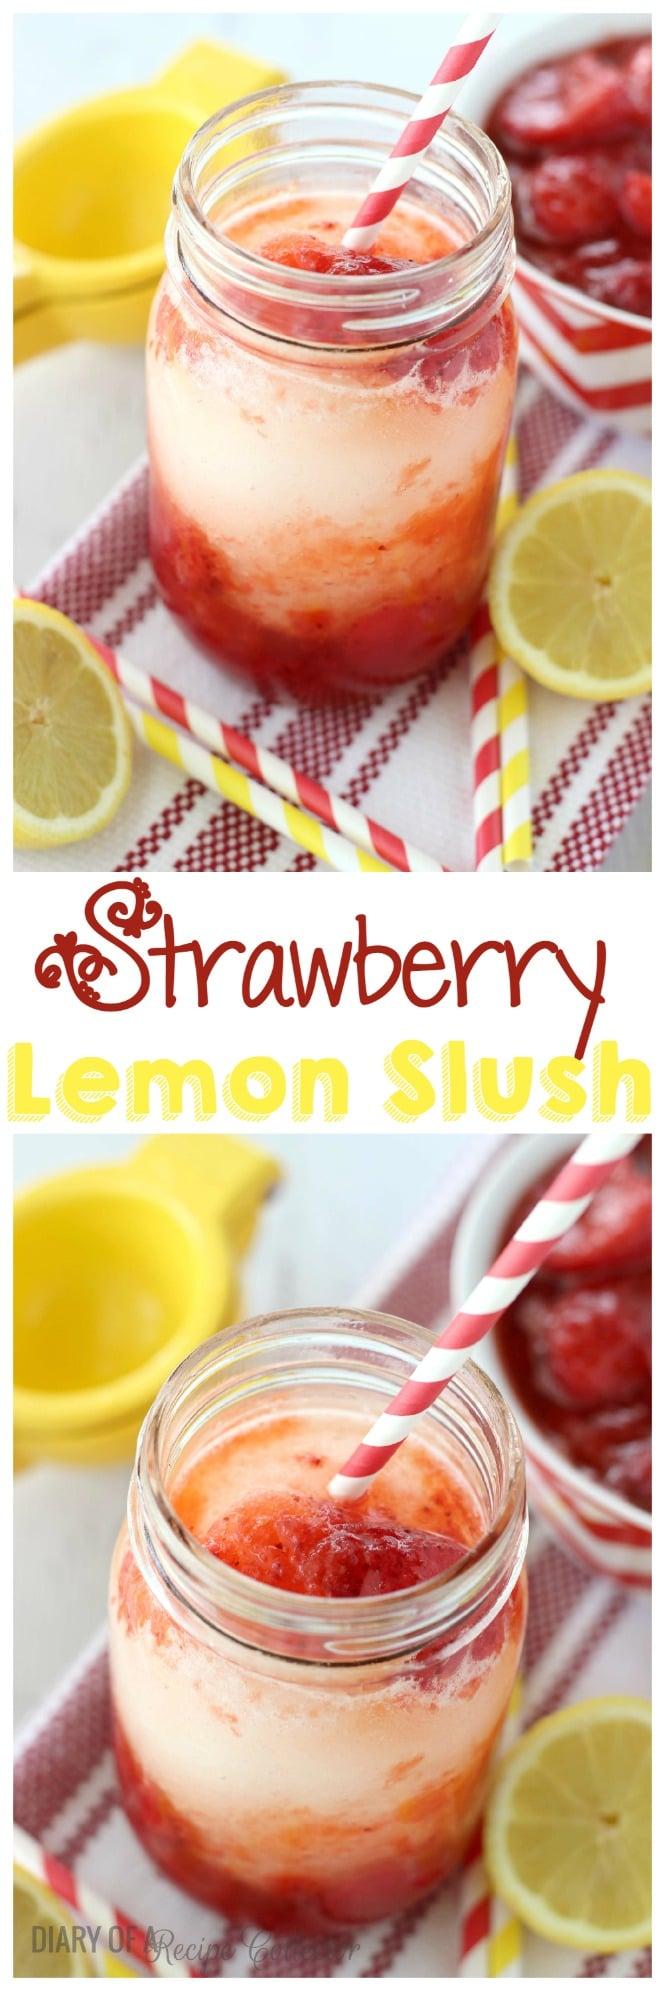 Strawberry Lemon Slush - Diary of a Recipe Collector